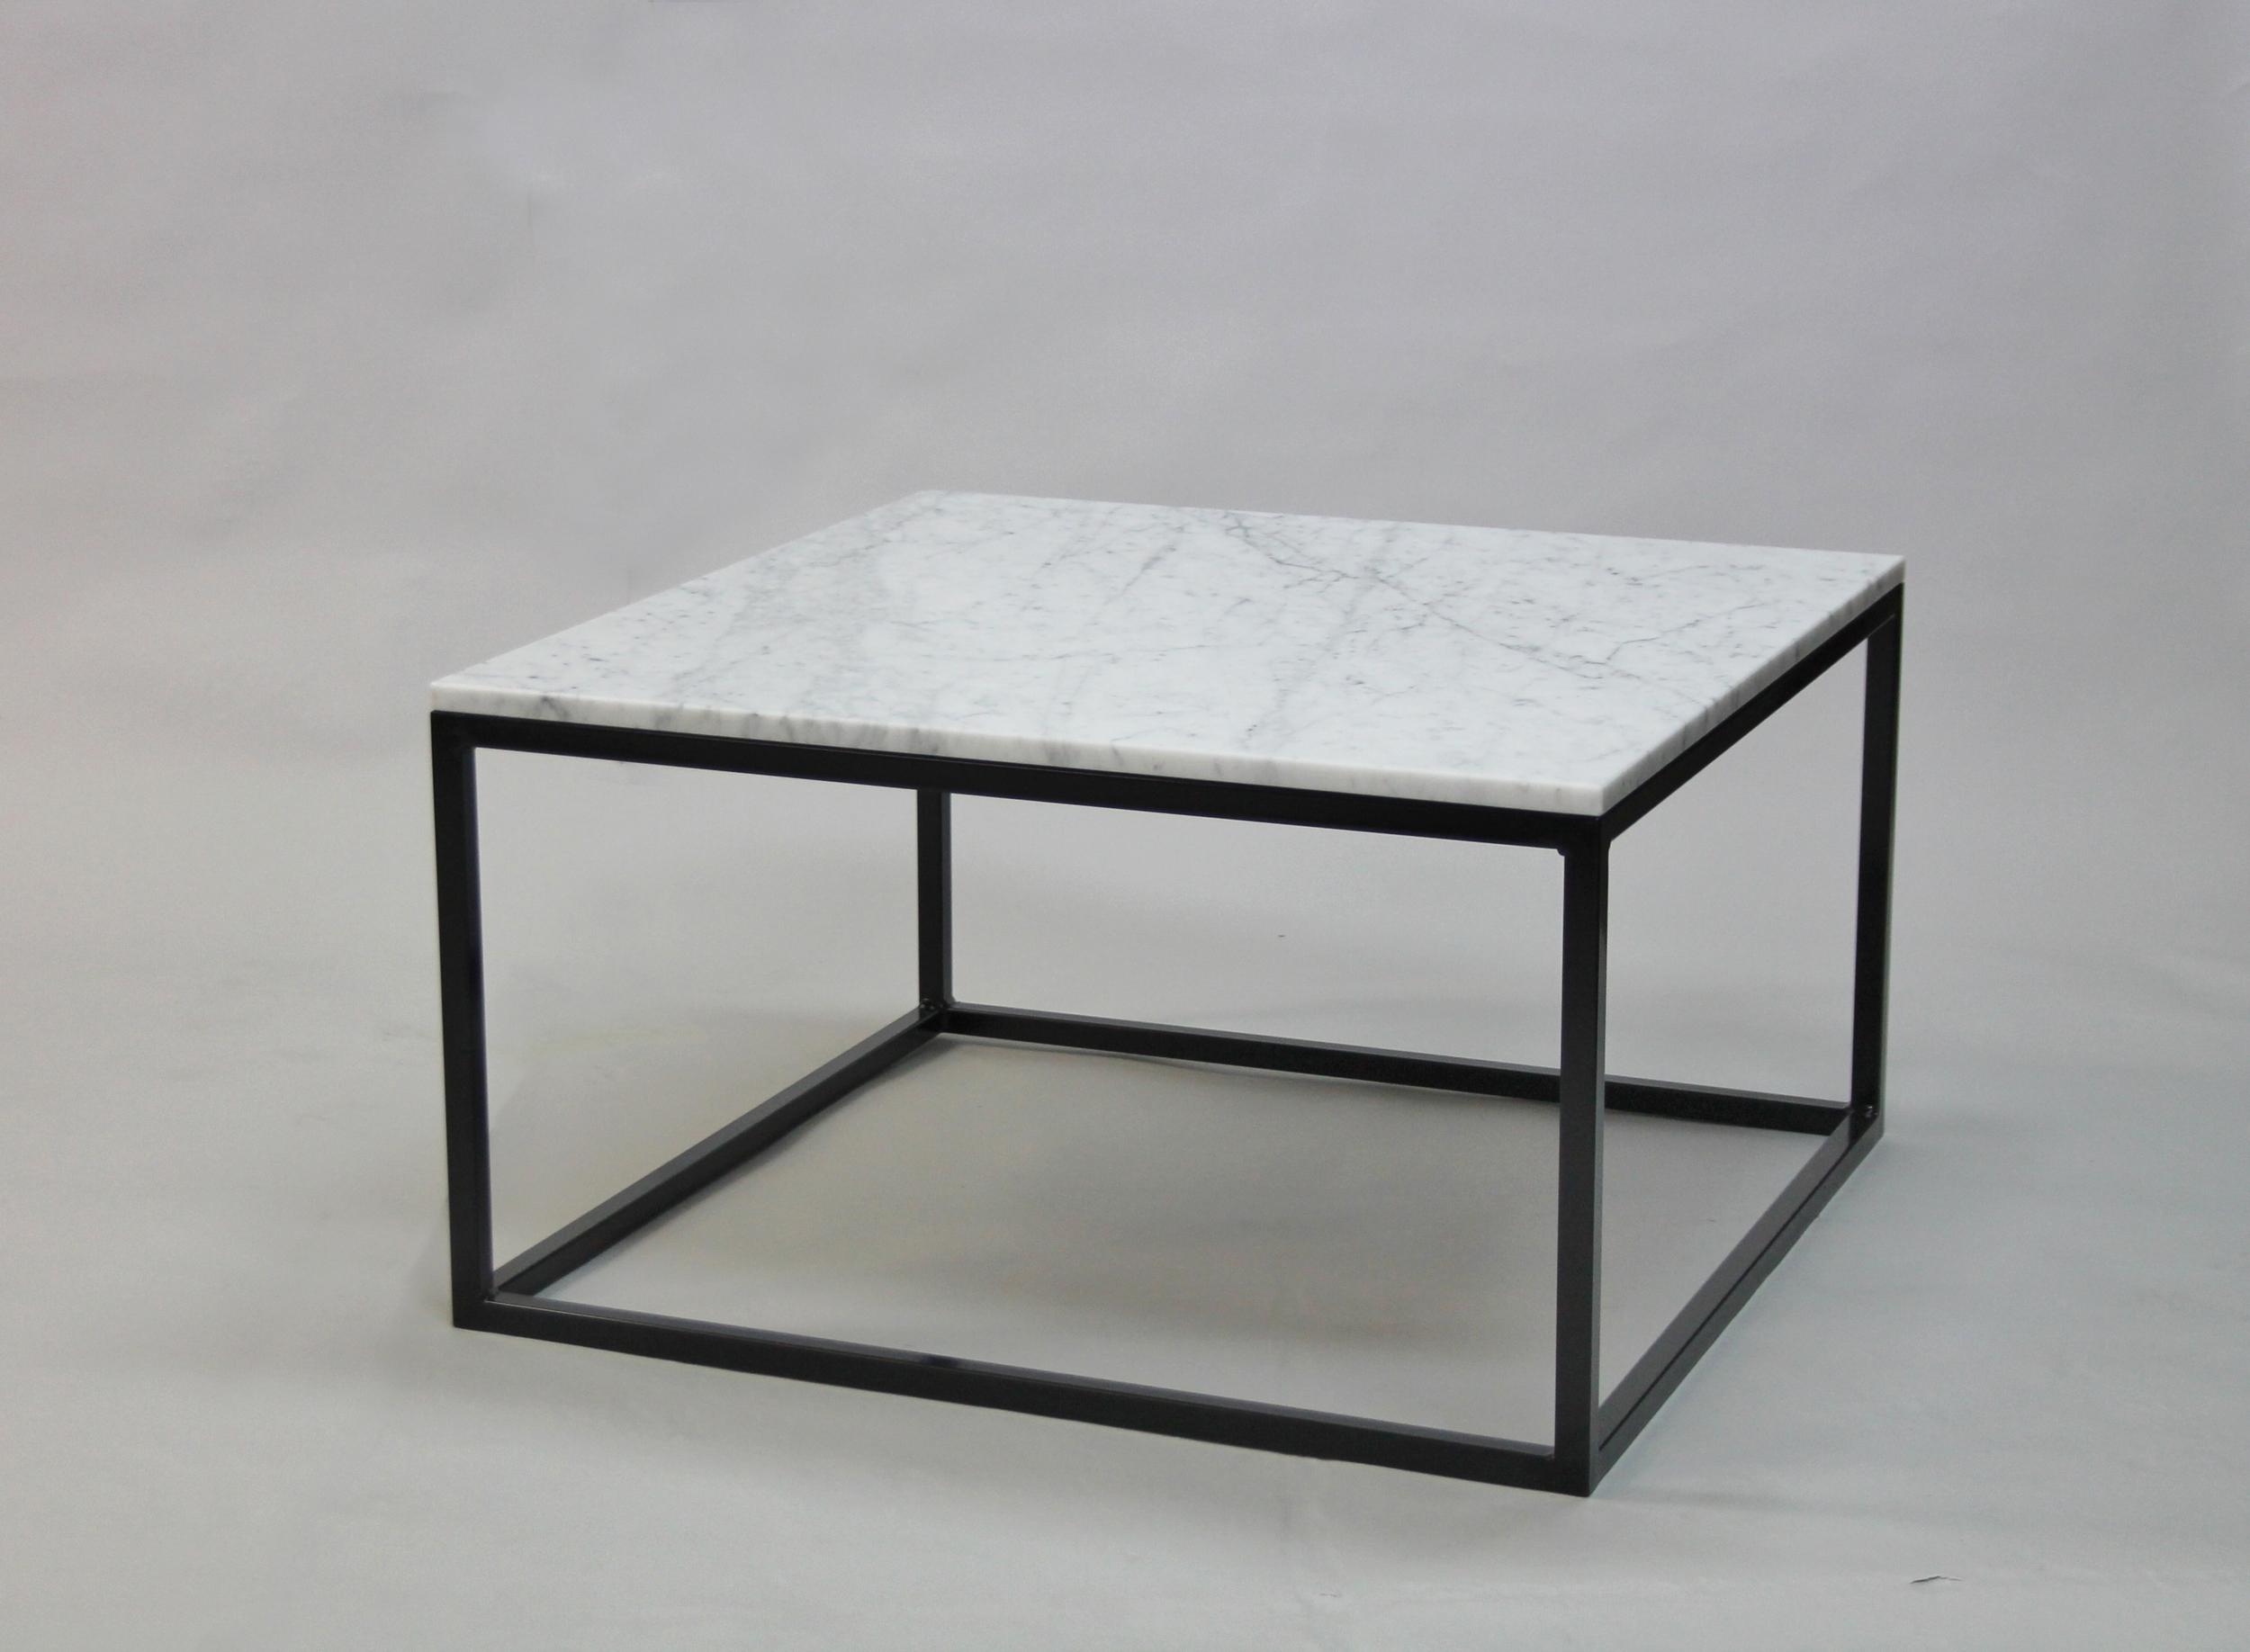 Marmorbord, vit - 80x80 x  45 cm, svart underrede kub  Pris 5 500 :- inkl frakt